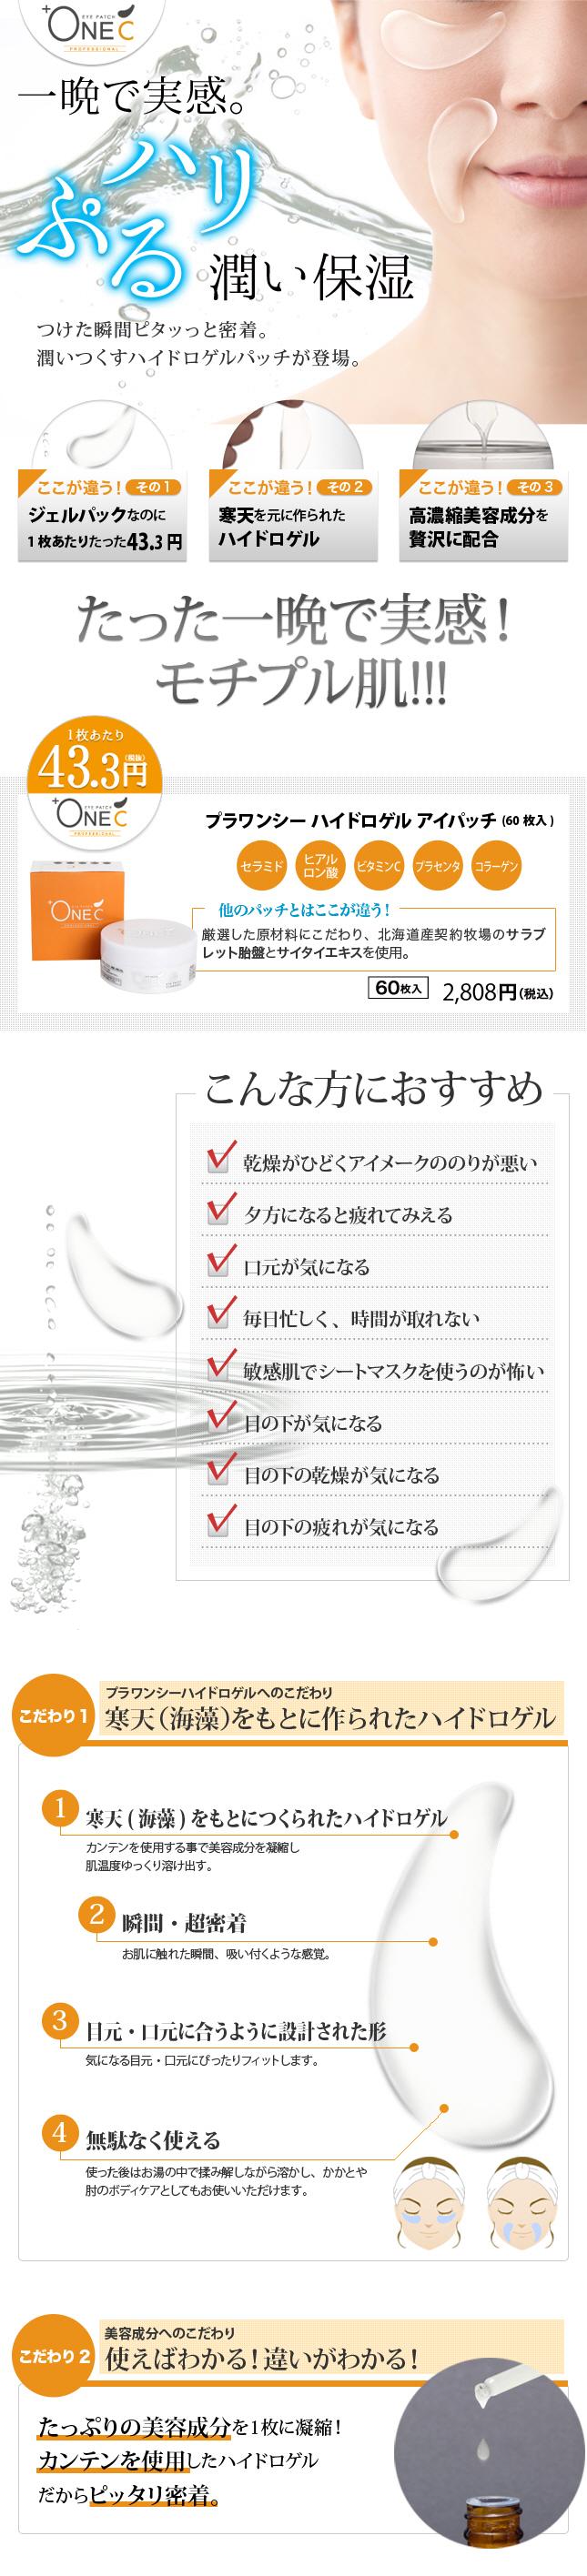 ss_eyepatch_lp-1-1.jpg